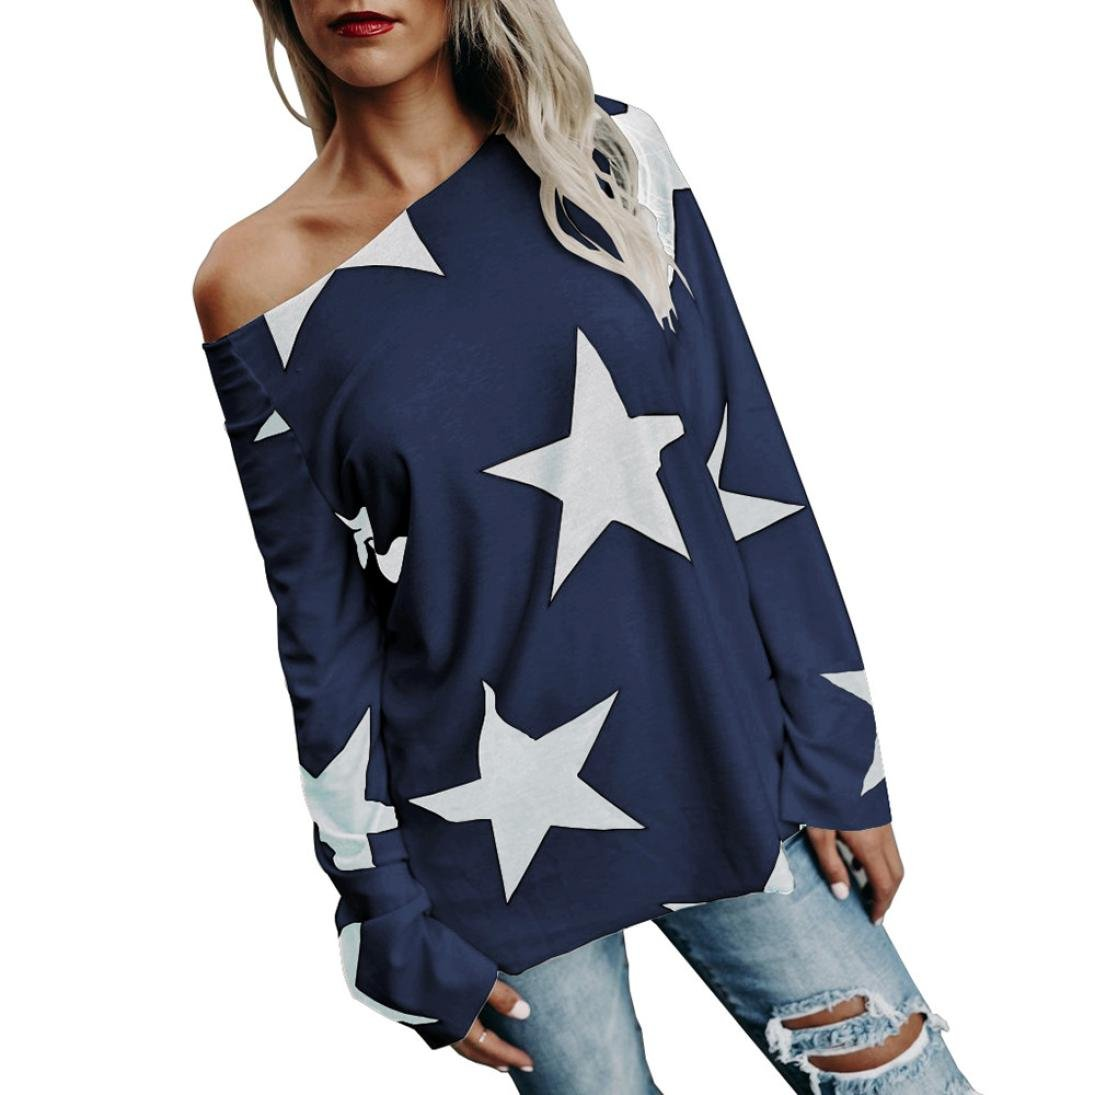 Malloom® Sweatshirt Damen Bluse Elegant Sterne Drucken Shirt Herbst Trägerlos Langarmshirts Locker Hemd Jumper Pullover Tops Oberteile